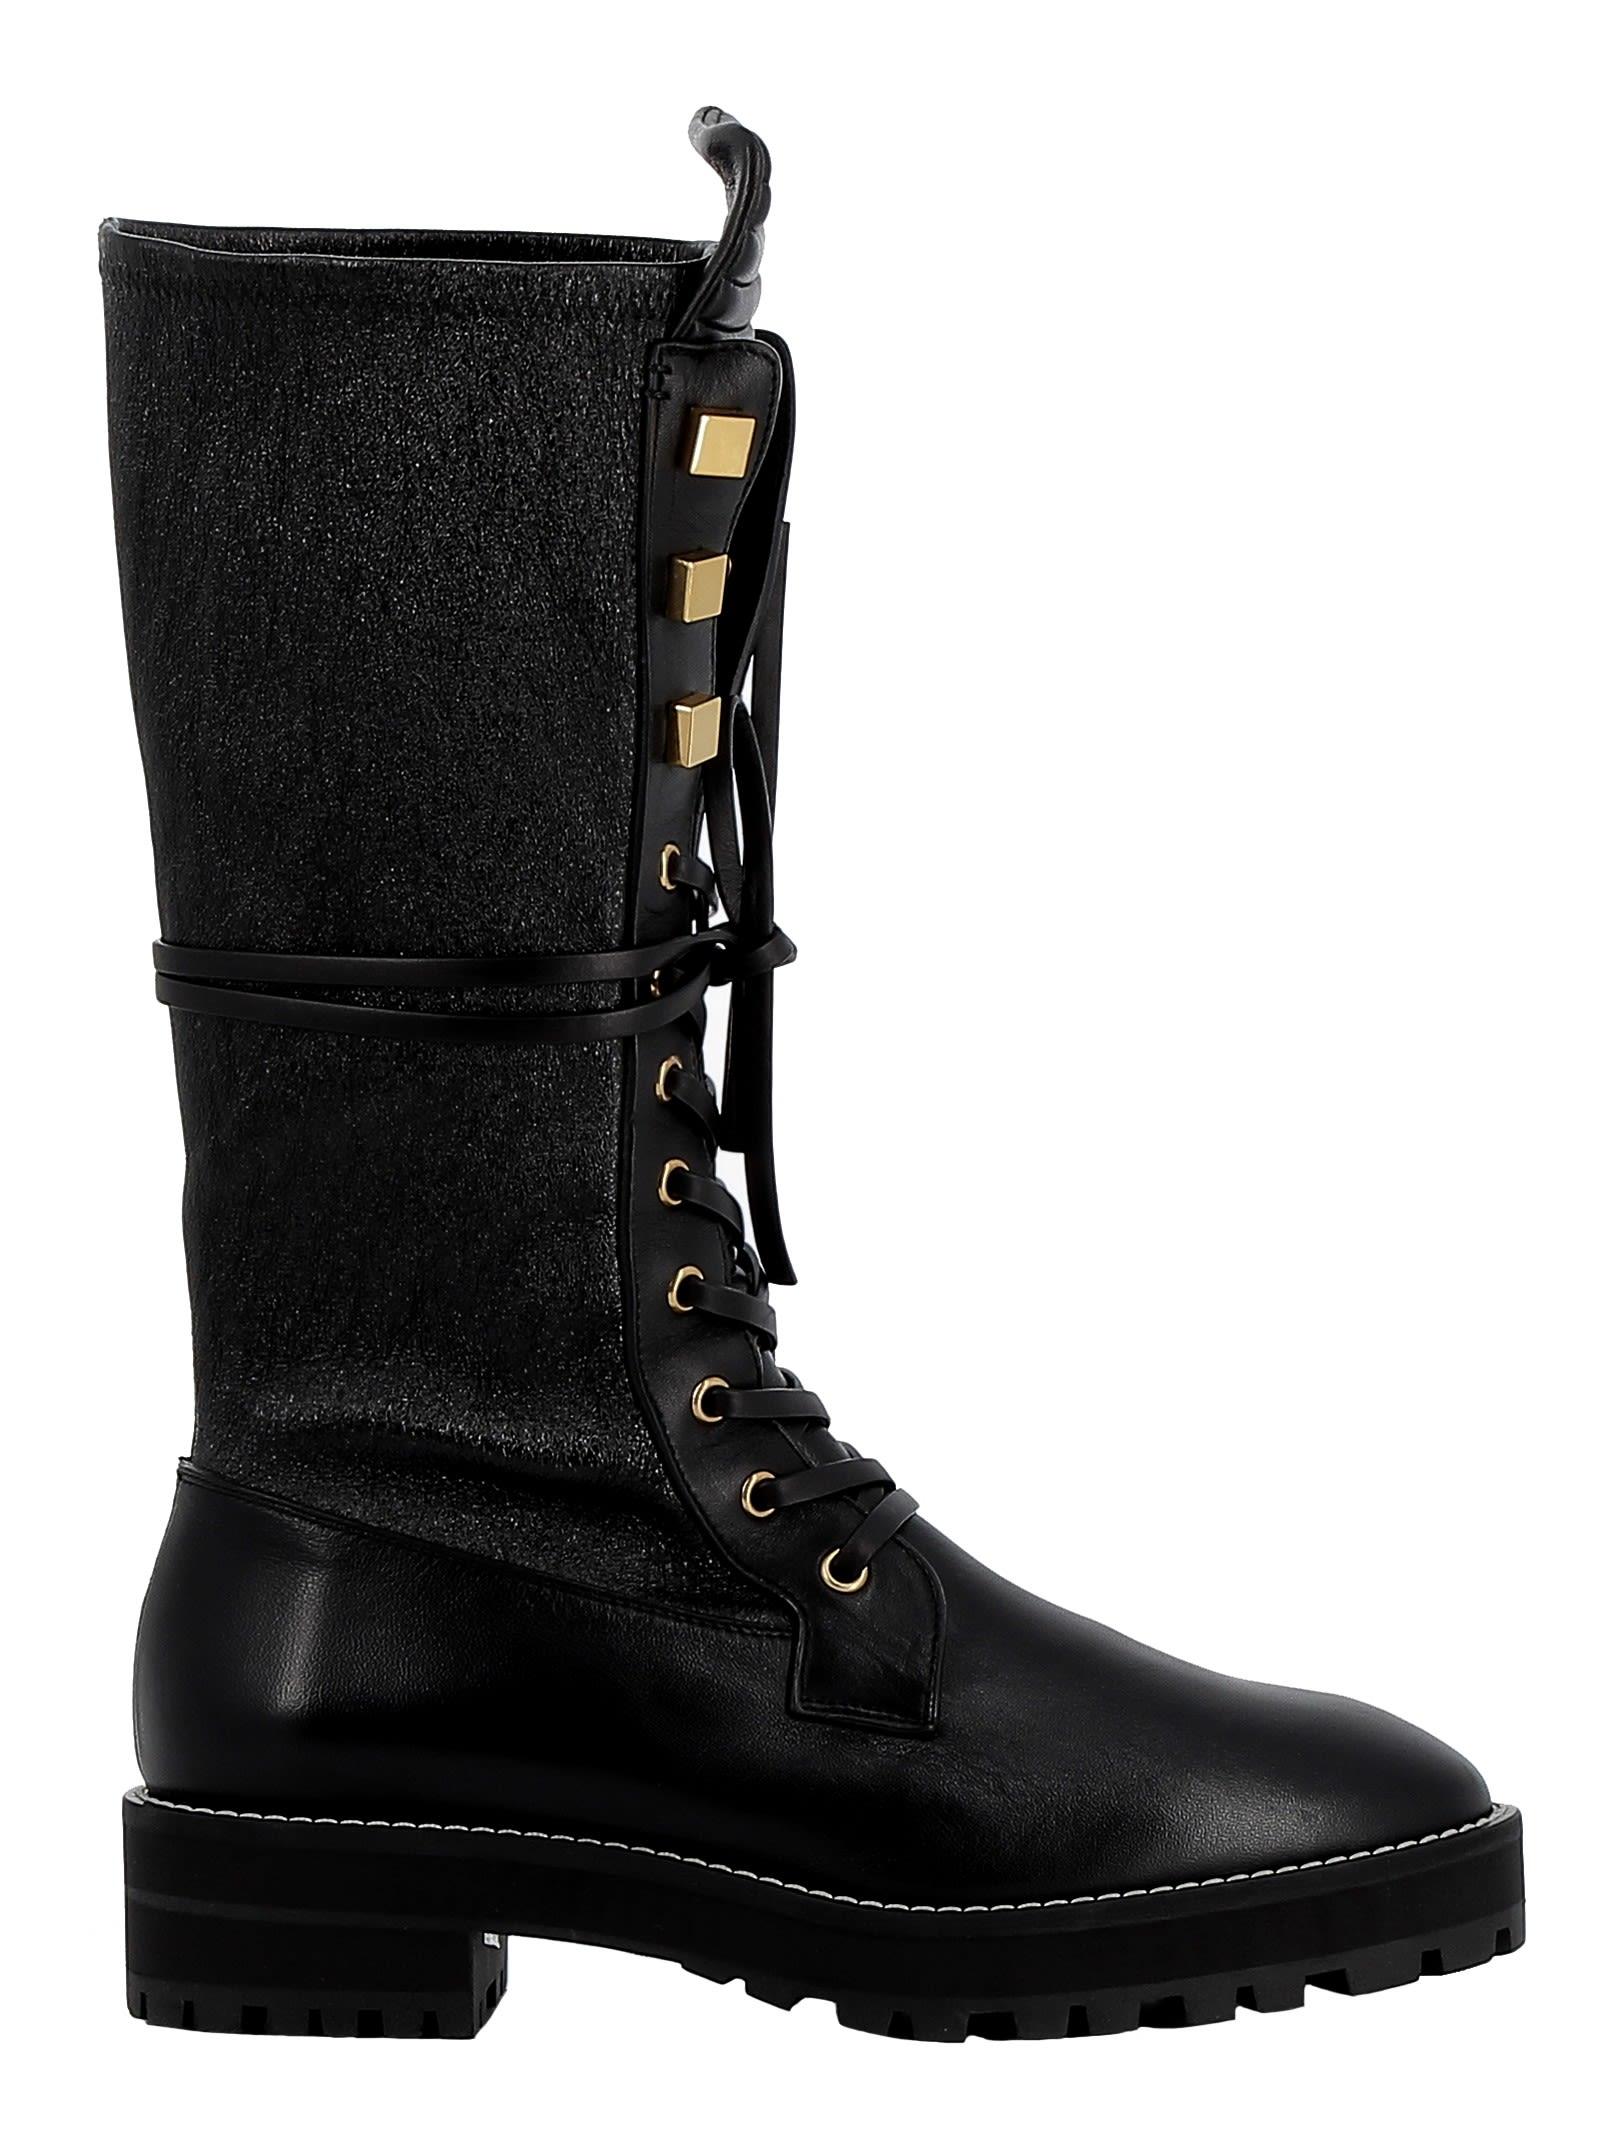 stuart weitzman -  Black Leather Boots